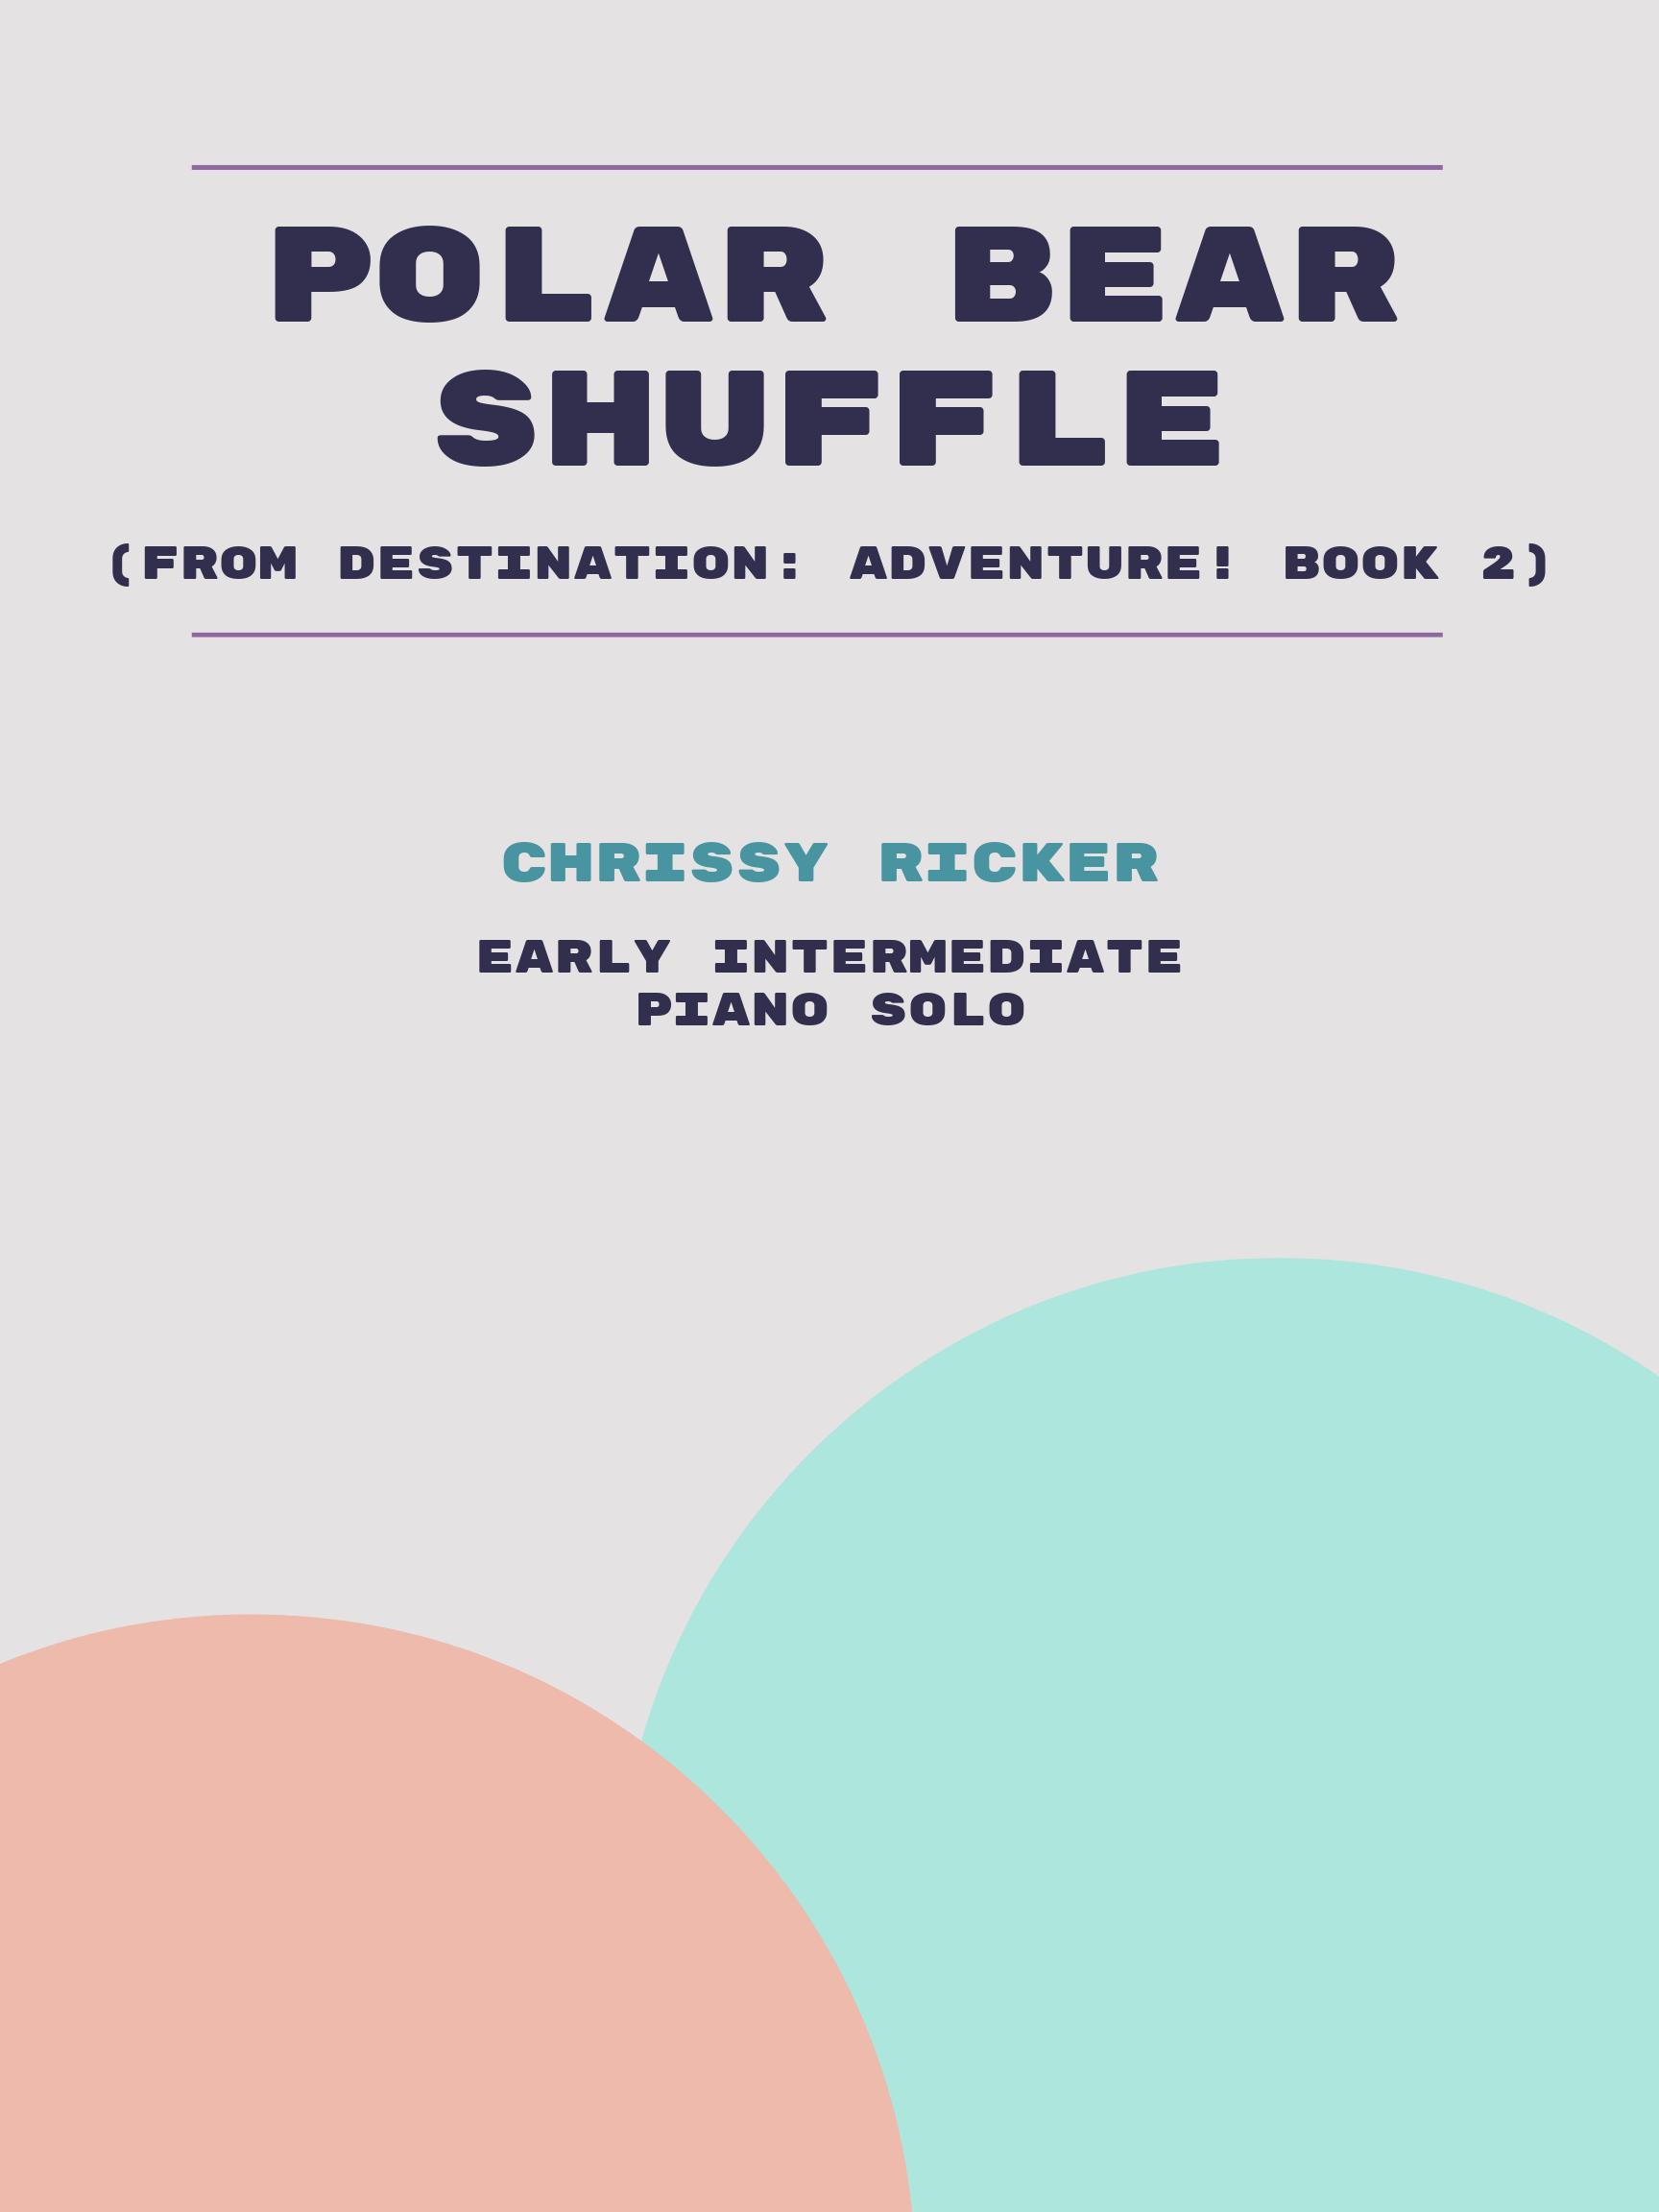 Polar Bear Shuffle by Chrissy Ricker